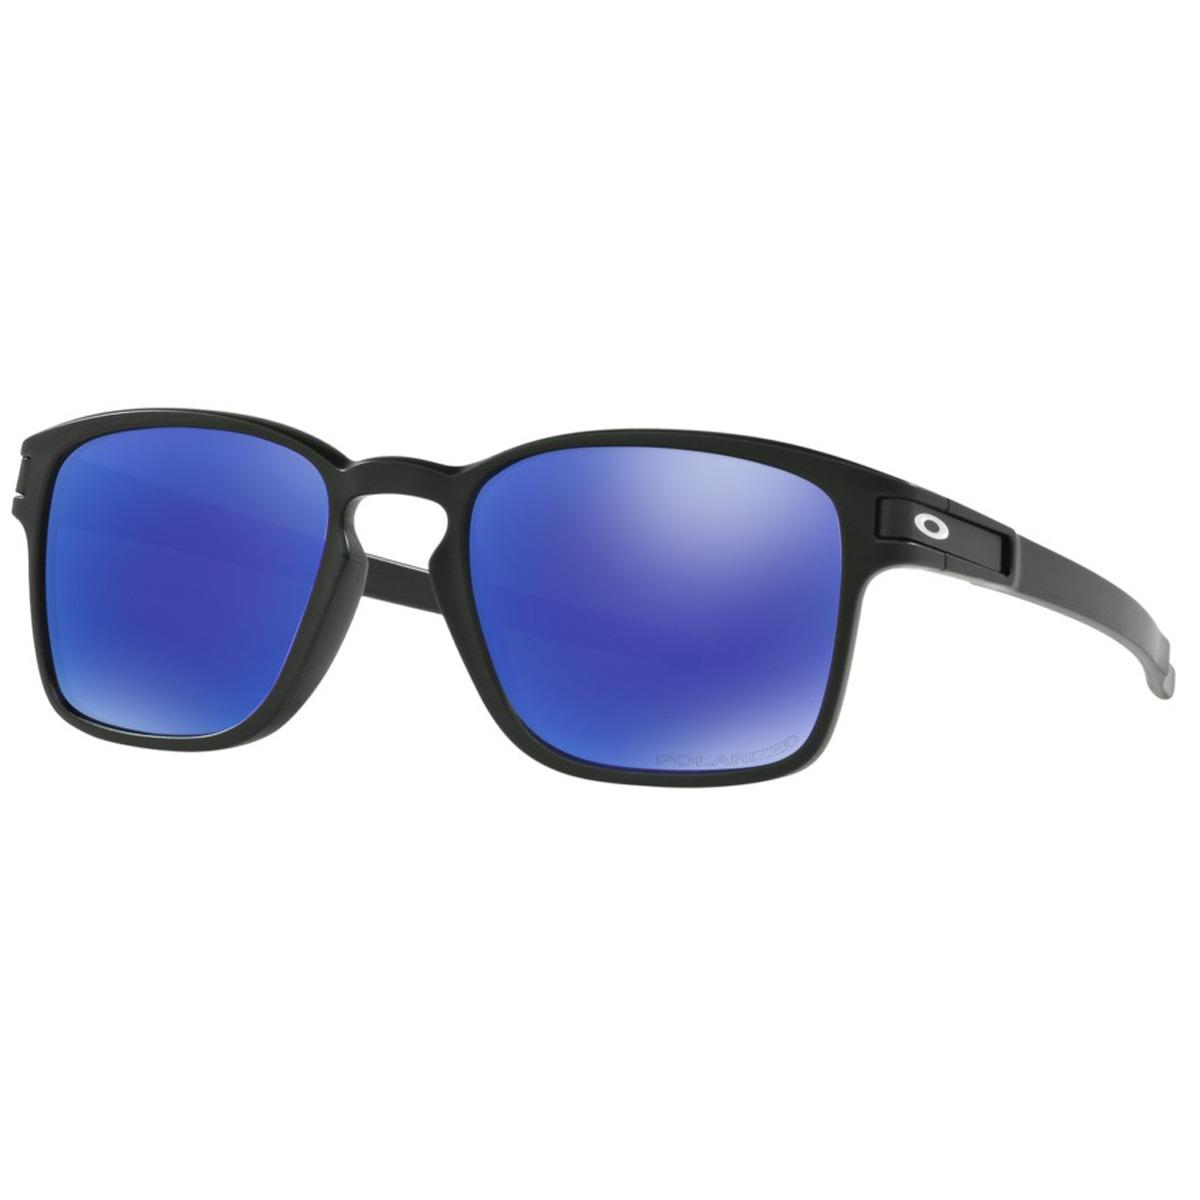 397eb34d6e óculos oakley latch square matte black  lente violet iridium. Carregando  zoom.